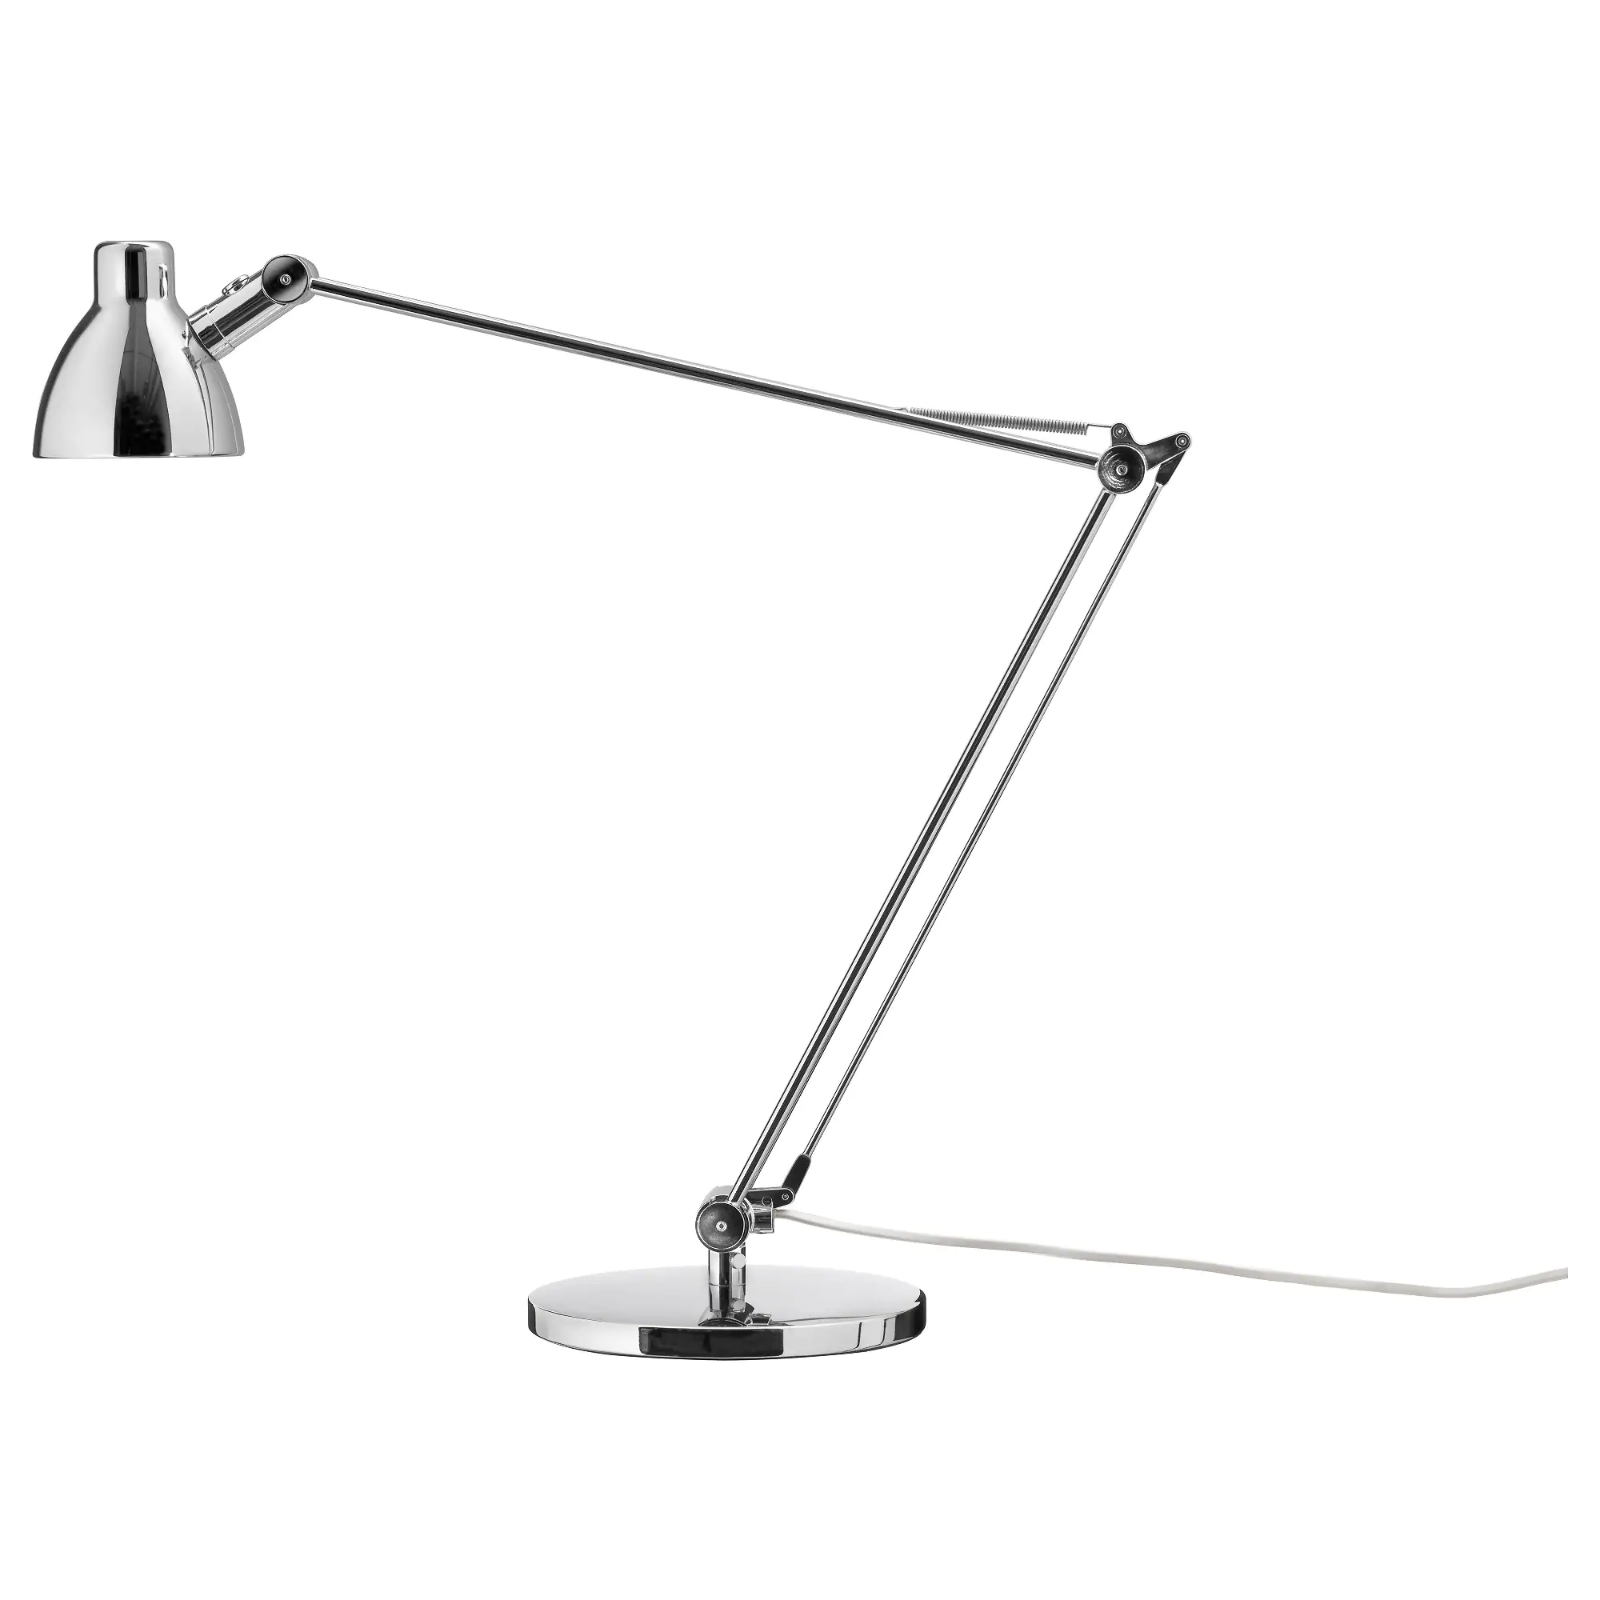 Nib Ikea Antifoni Table Desk Lamp Work Reading Adjustable Matte Silver 19057 35 00 Silver Desk Lamps Ideas Of Silver Desk In 2020 Lamp Work Lamp Led Light Bulb